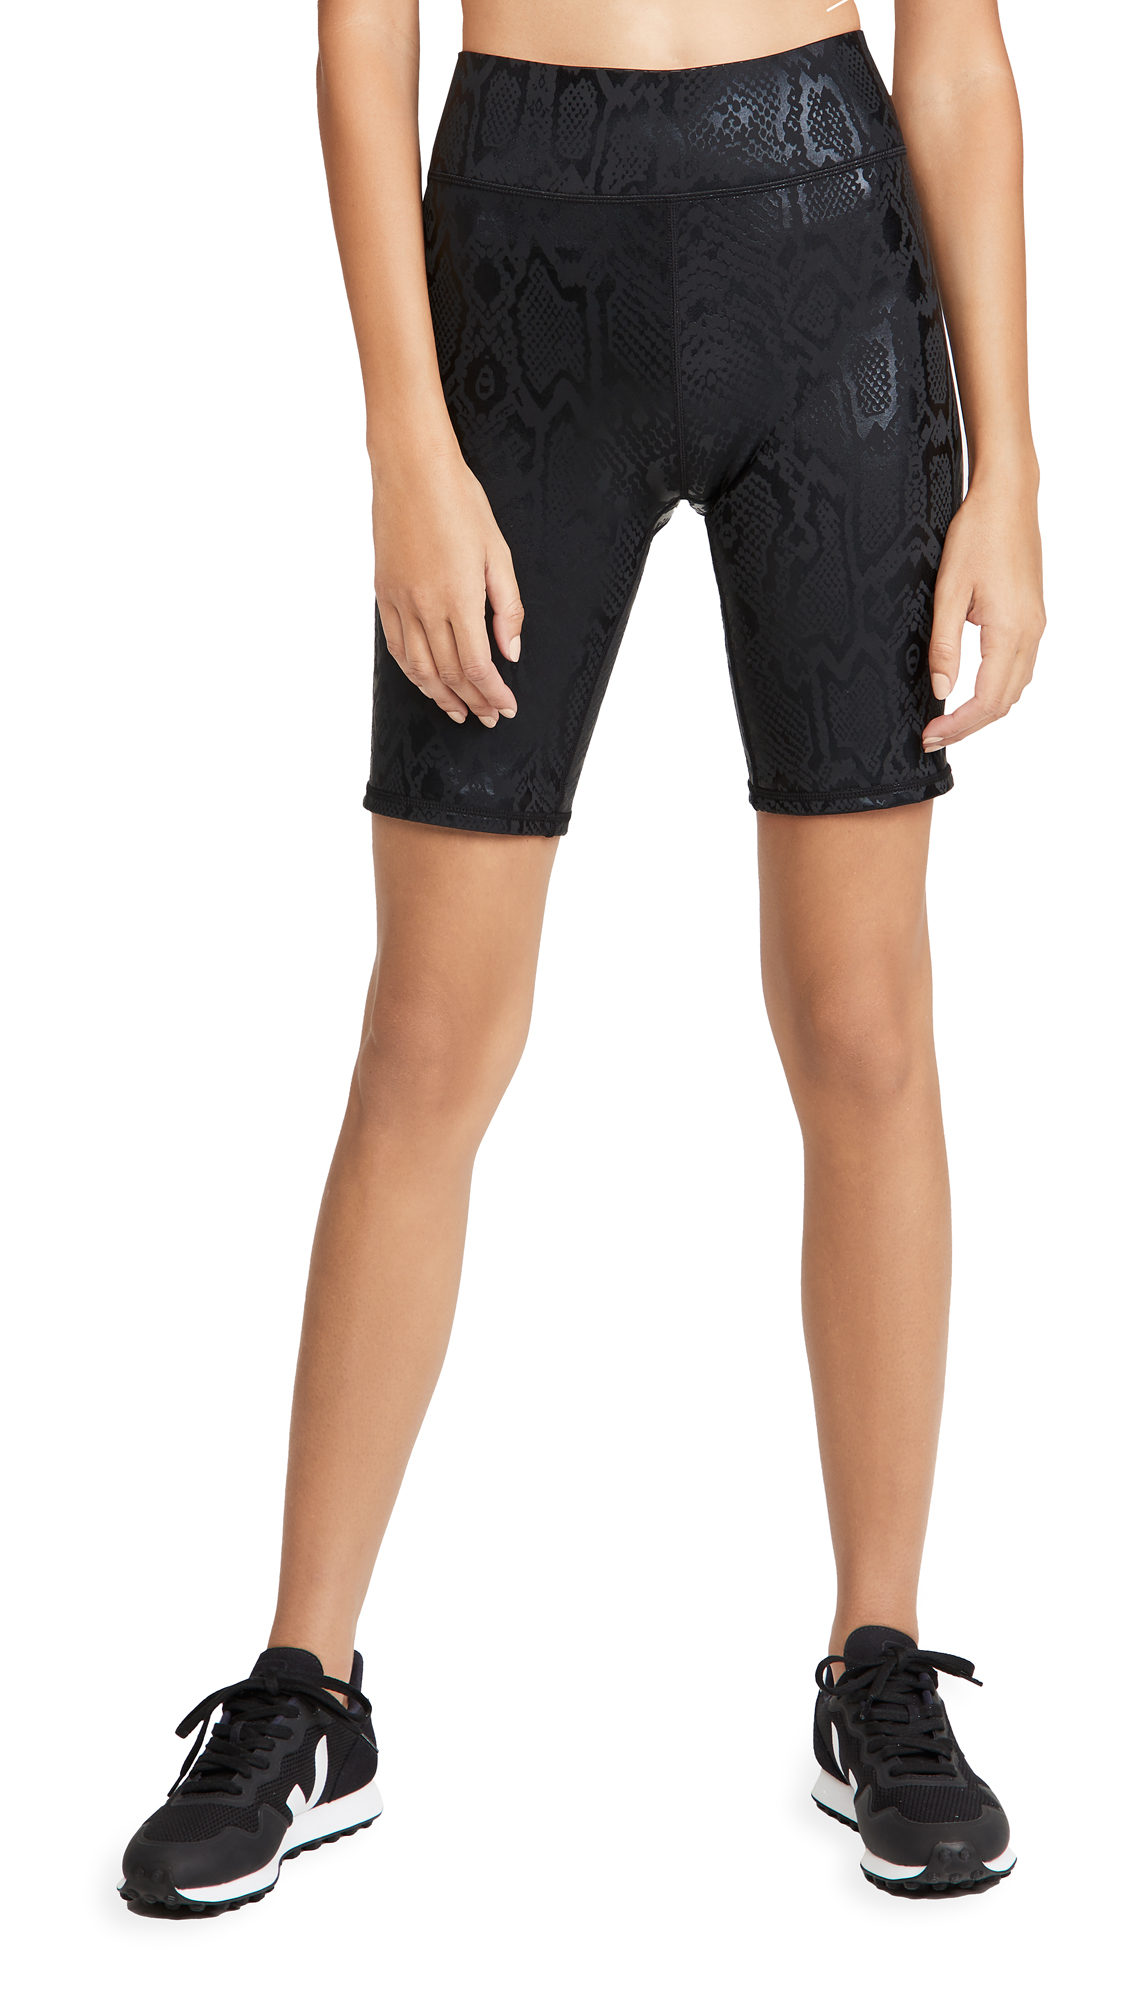 Terez Black Snakeskin Foil Bike Shorts